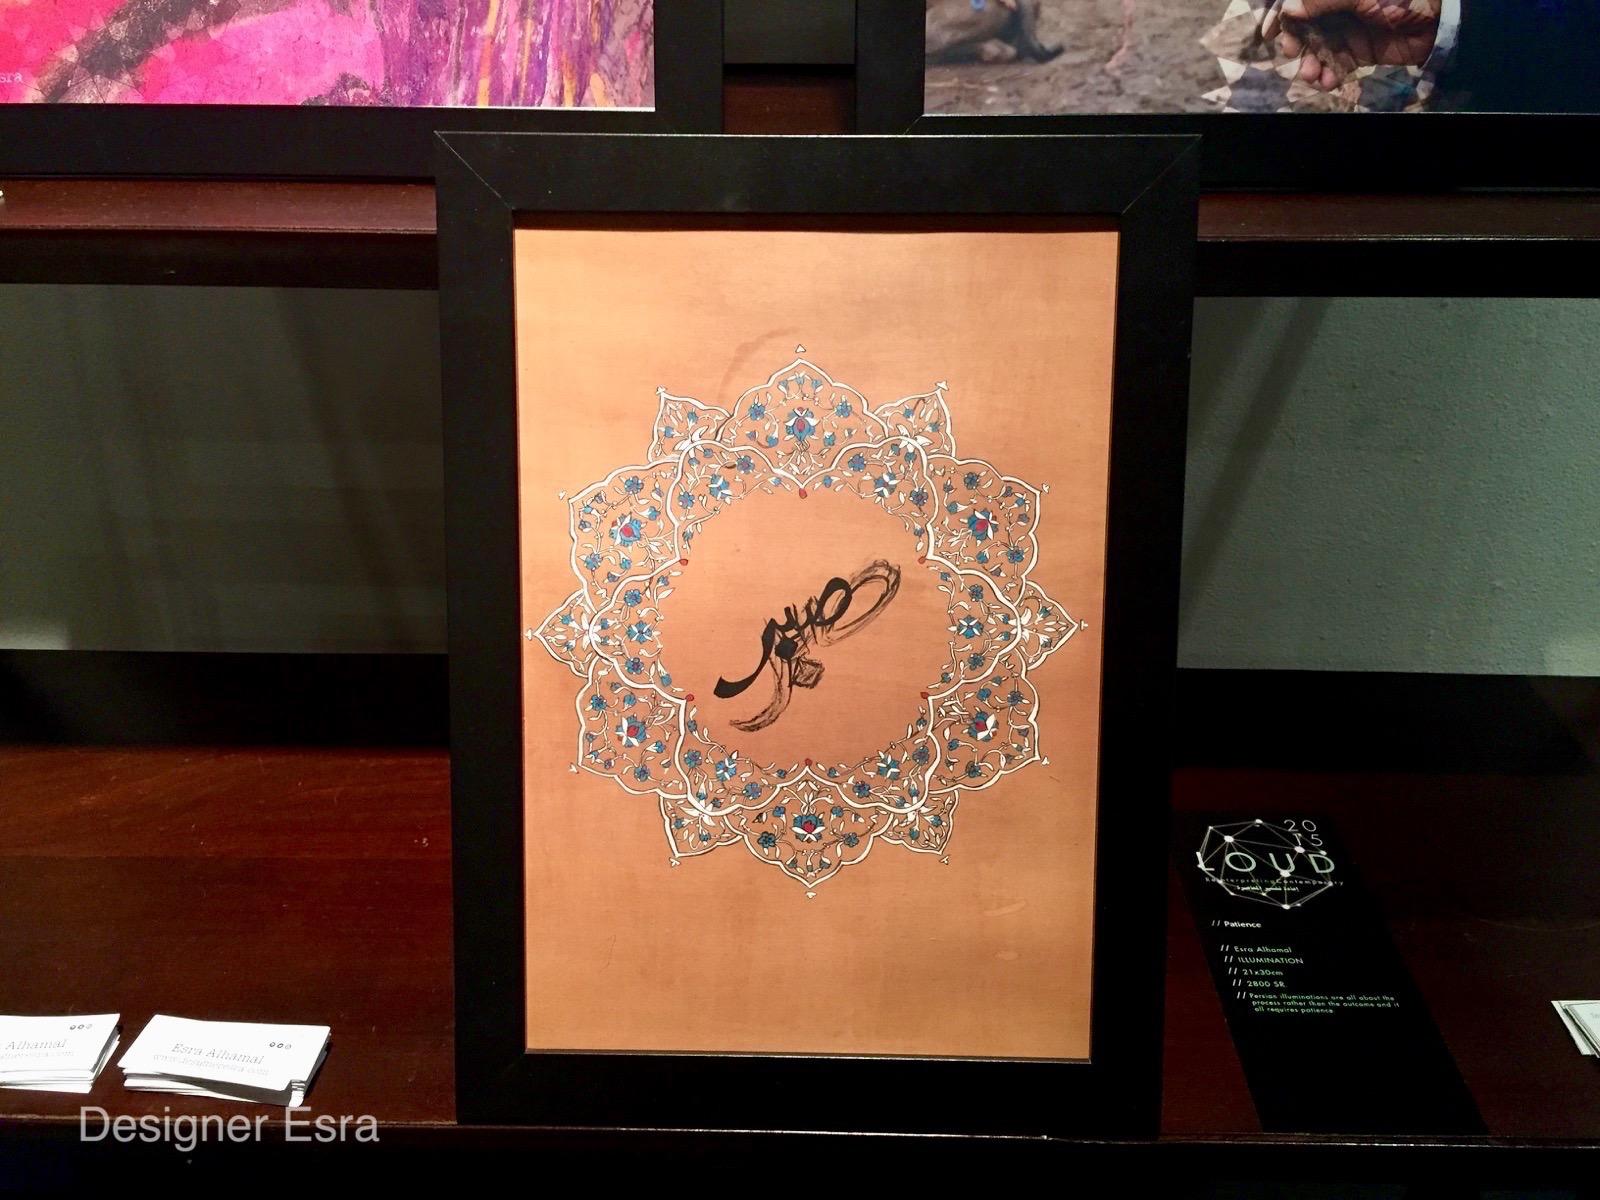 Islamic Illumination and Arabic Calligraphy